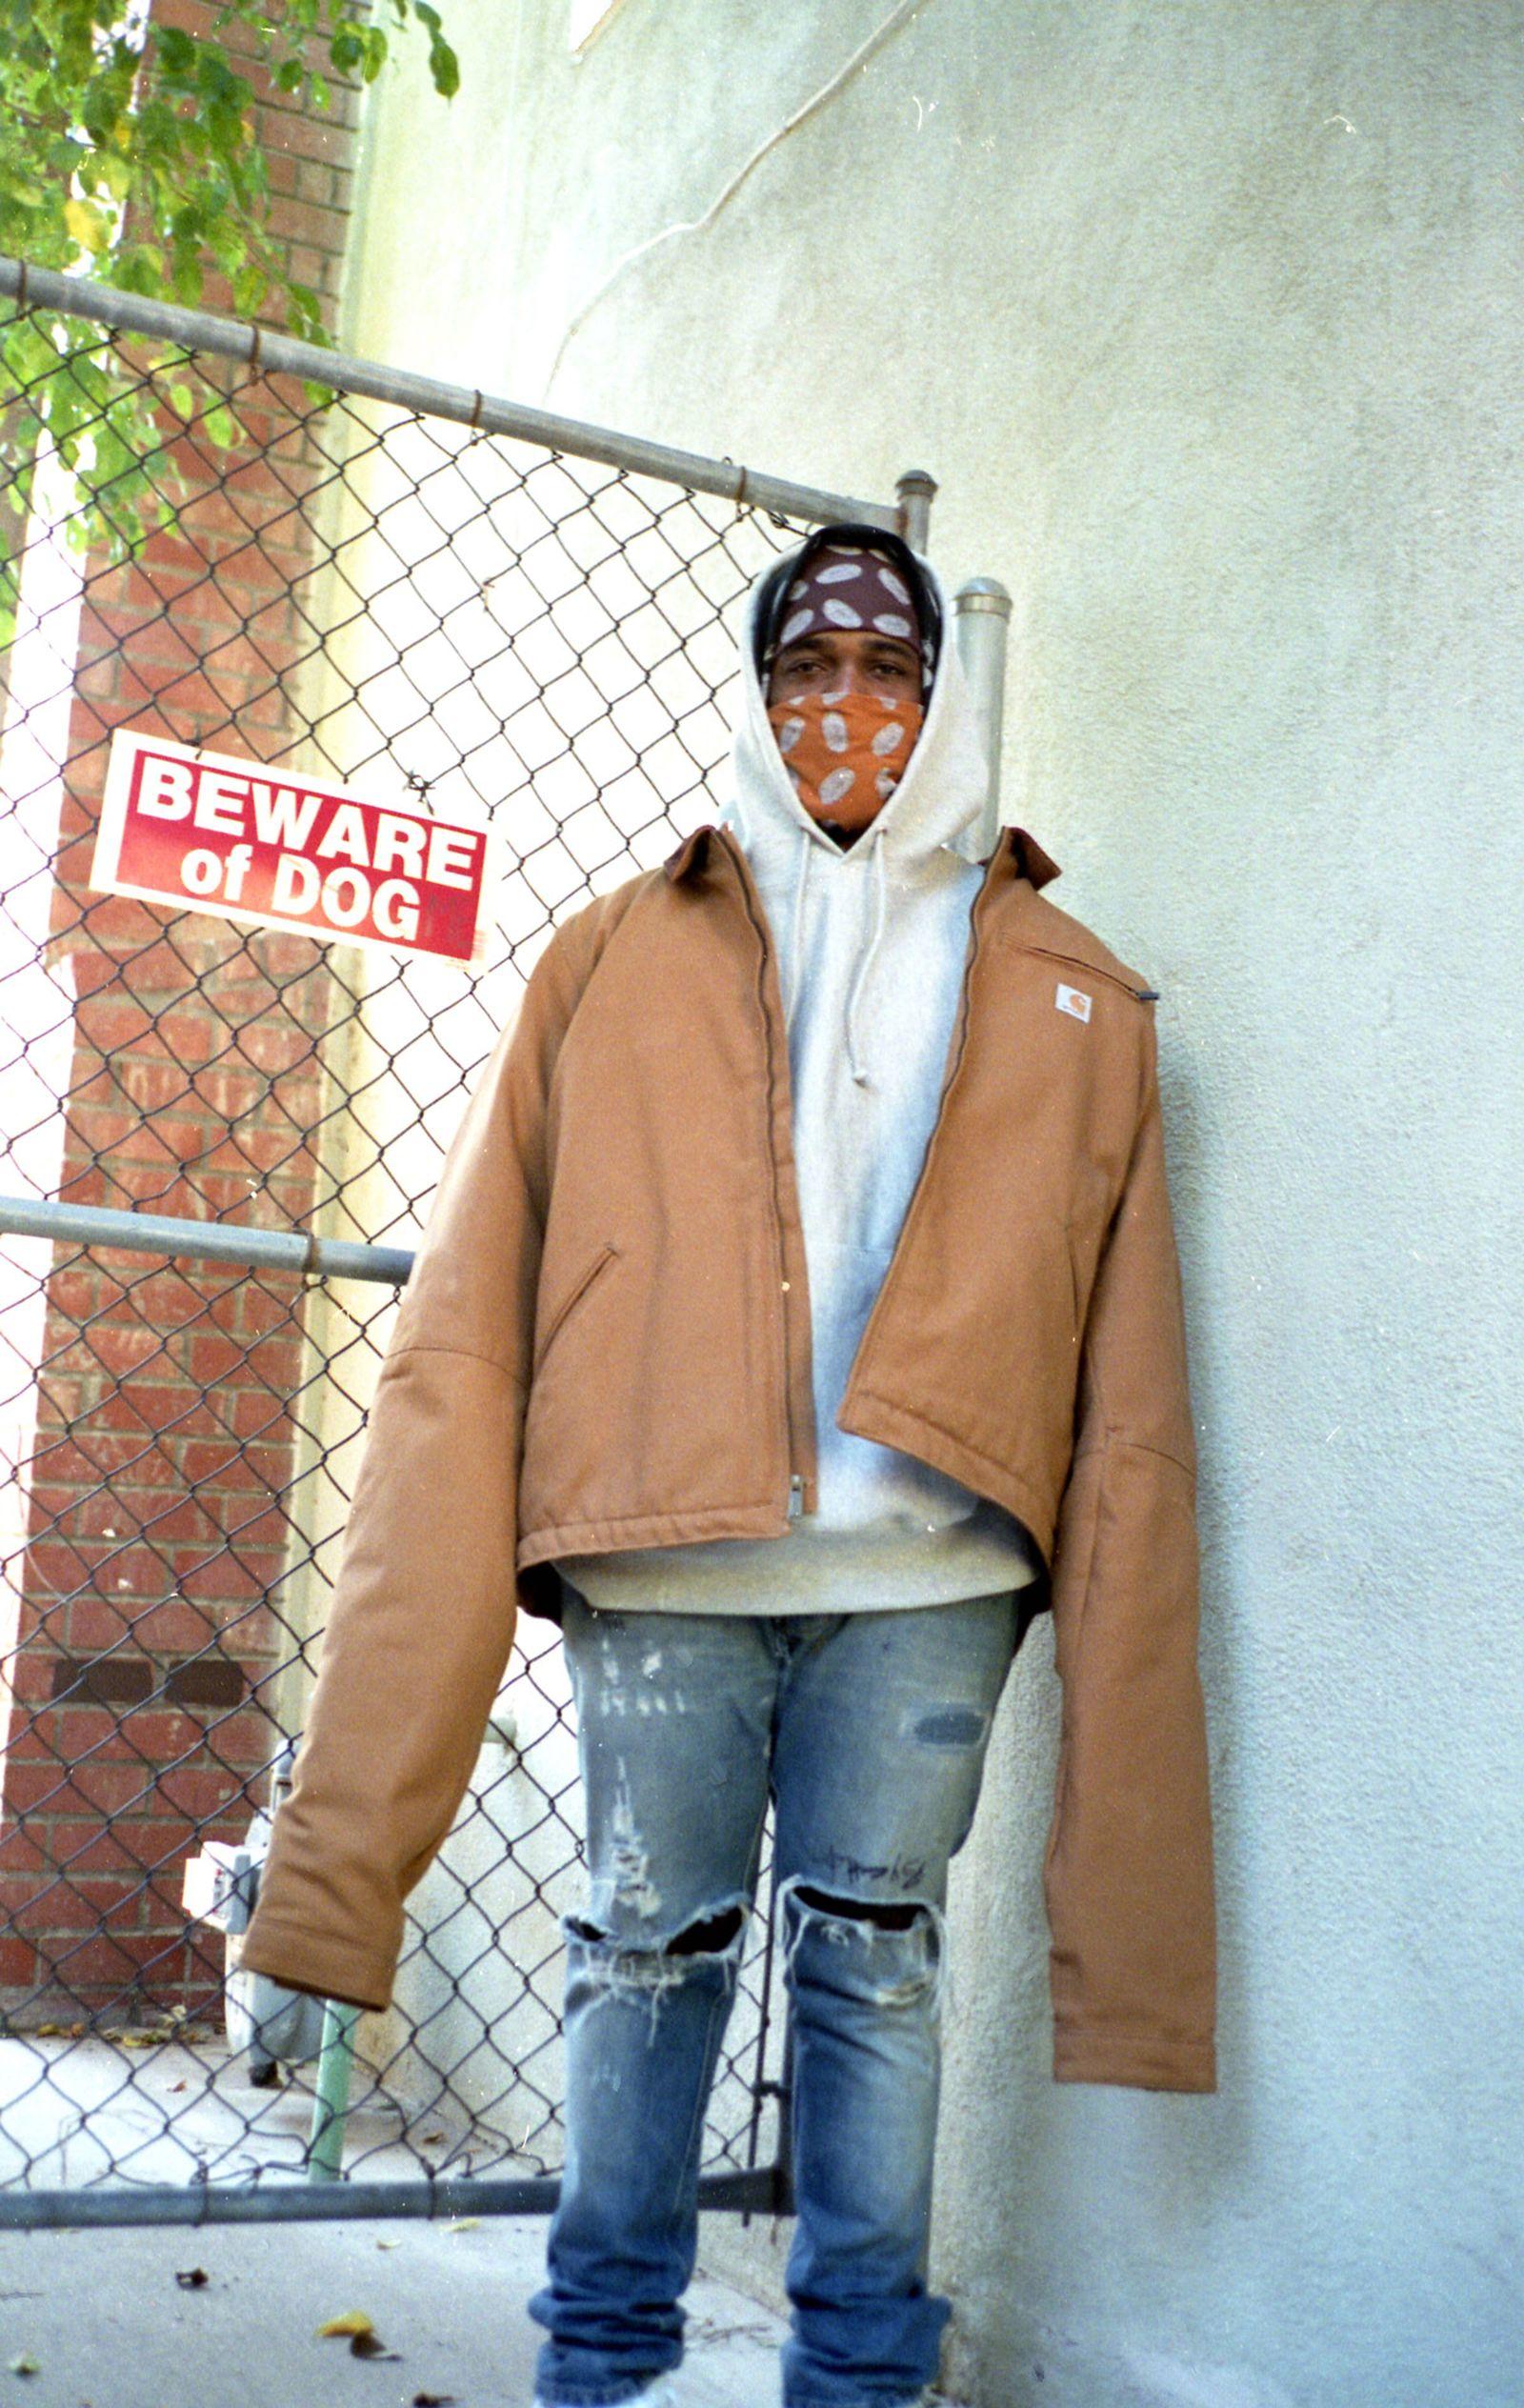 jacket CARHARTT hoodie TNYCE X CHAMPION jeans KSUBI Footwear CPFM NIKE DUNKS Accessories CUSTOM SEWER SOUNDS BANDANAS